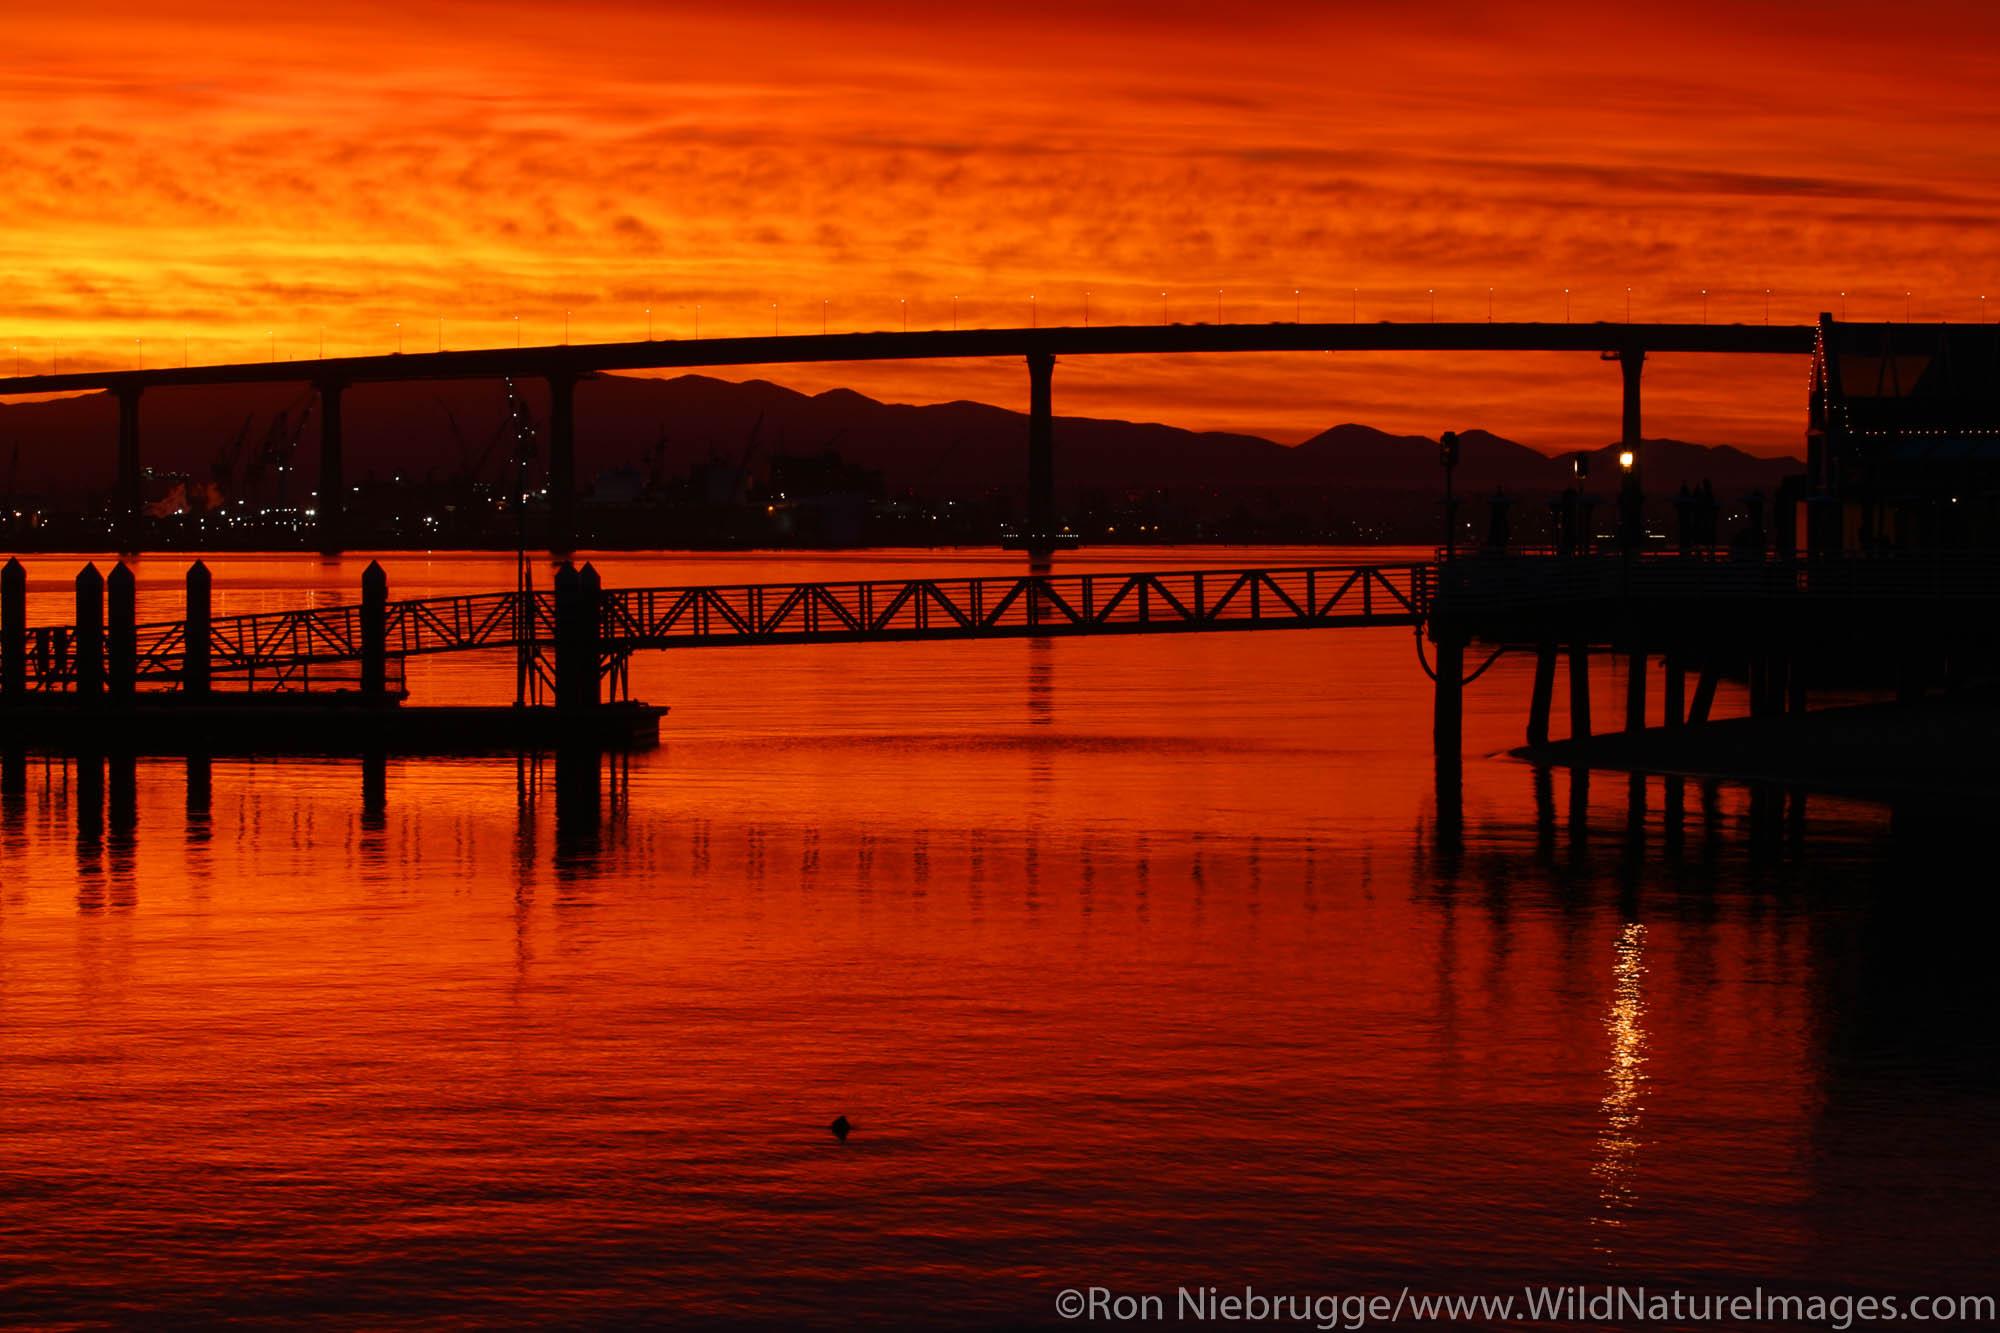 Coronado and the Coronado Bridge during sunrise, San Diego, California.